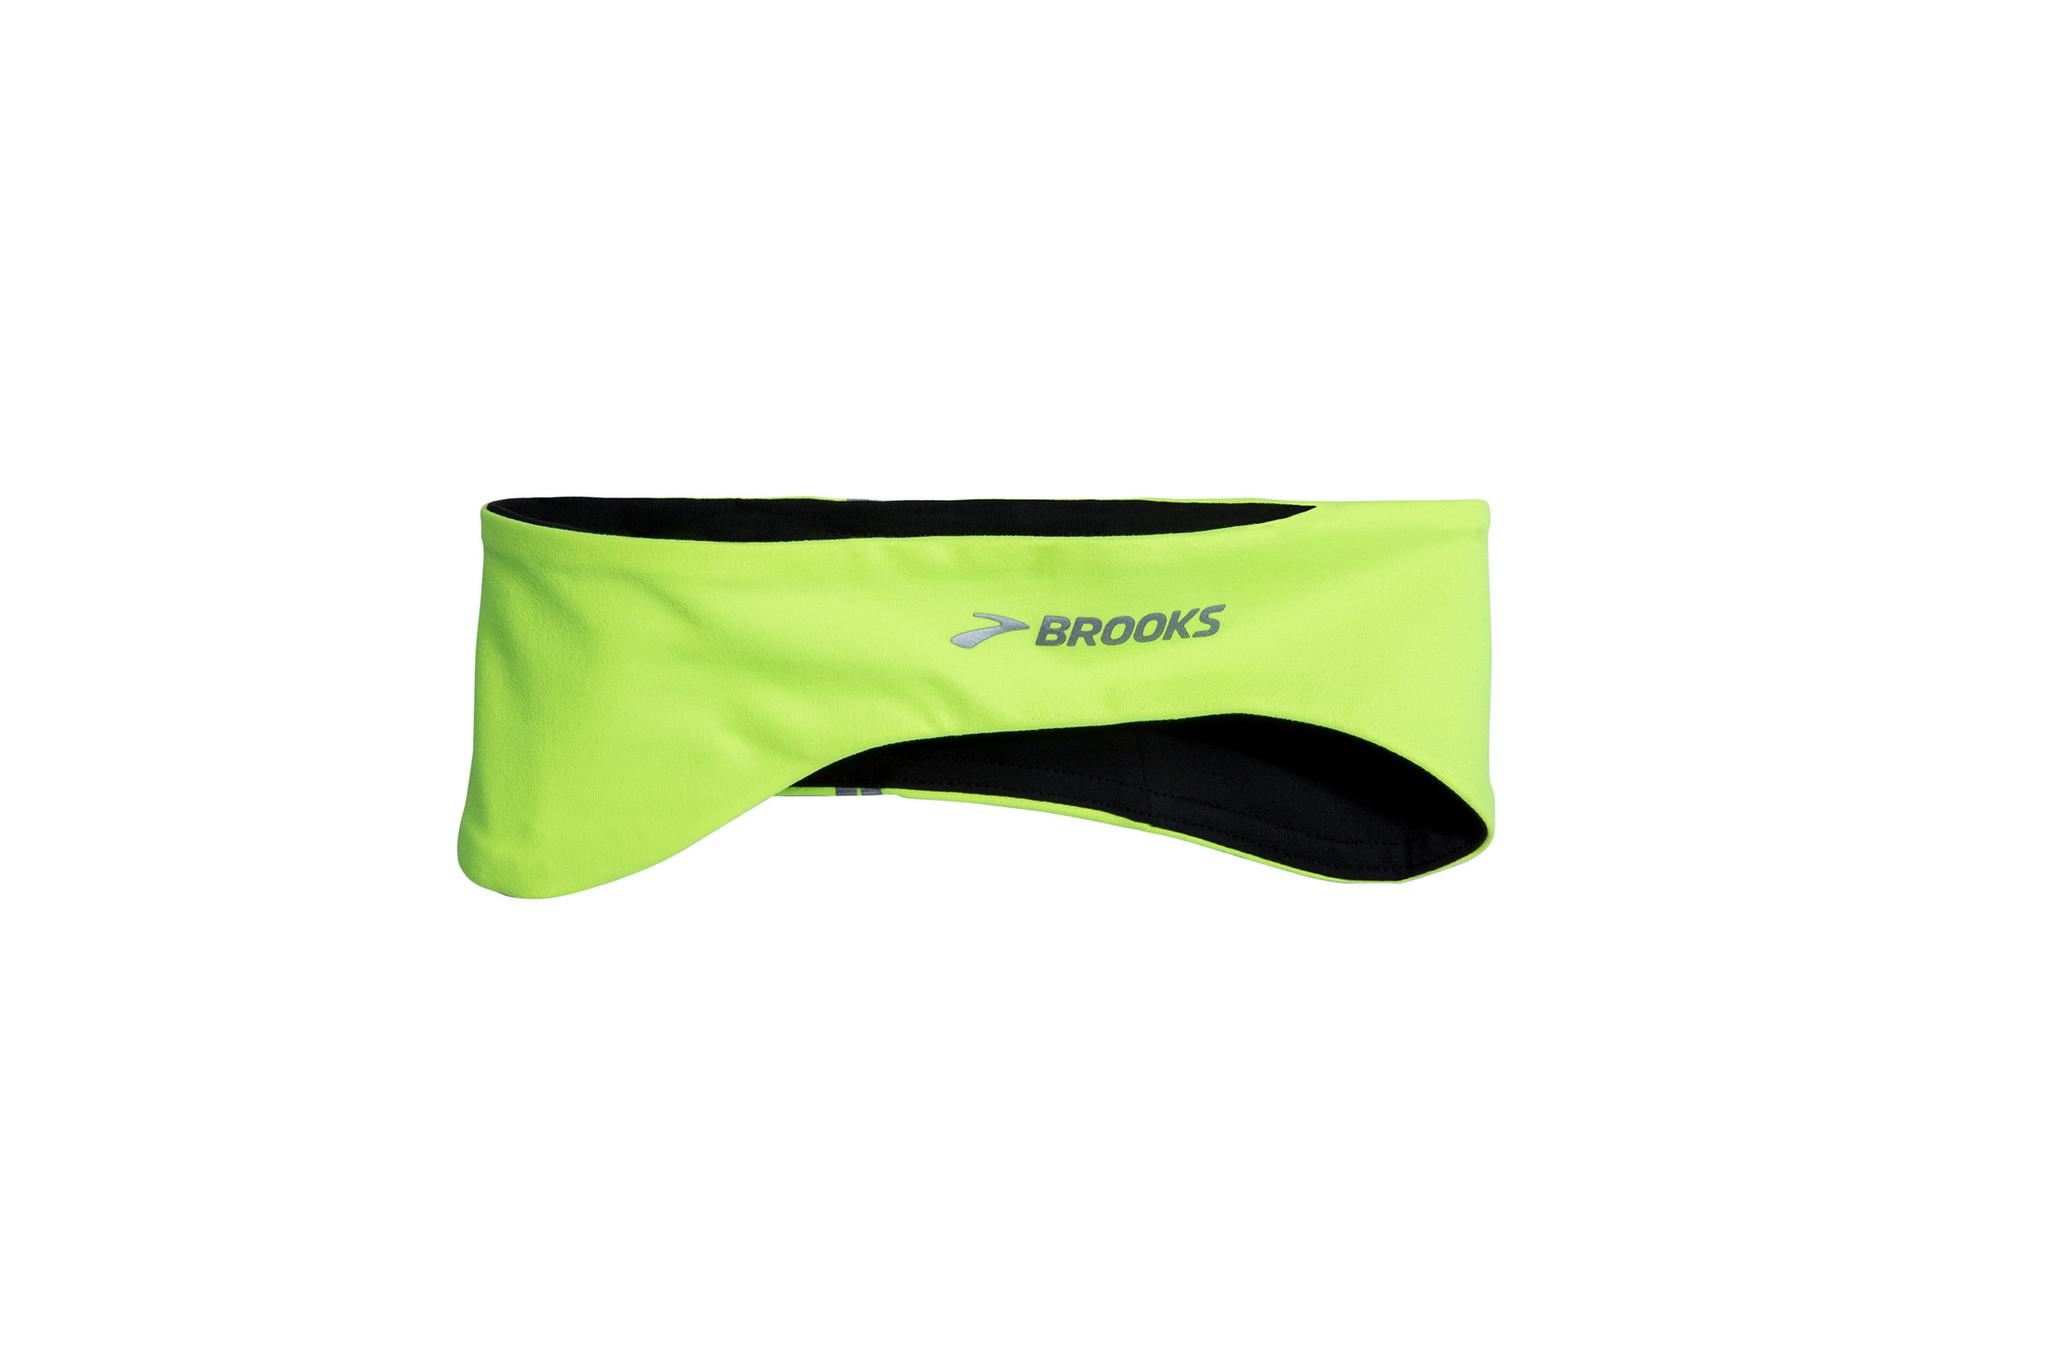 Brooks Brooks Greenlight Headband